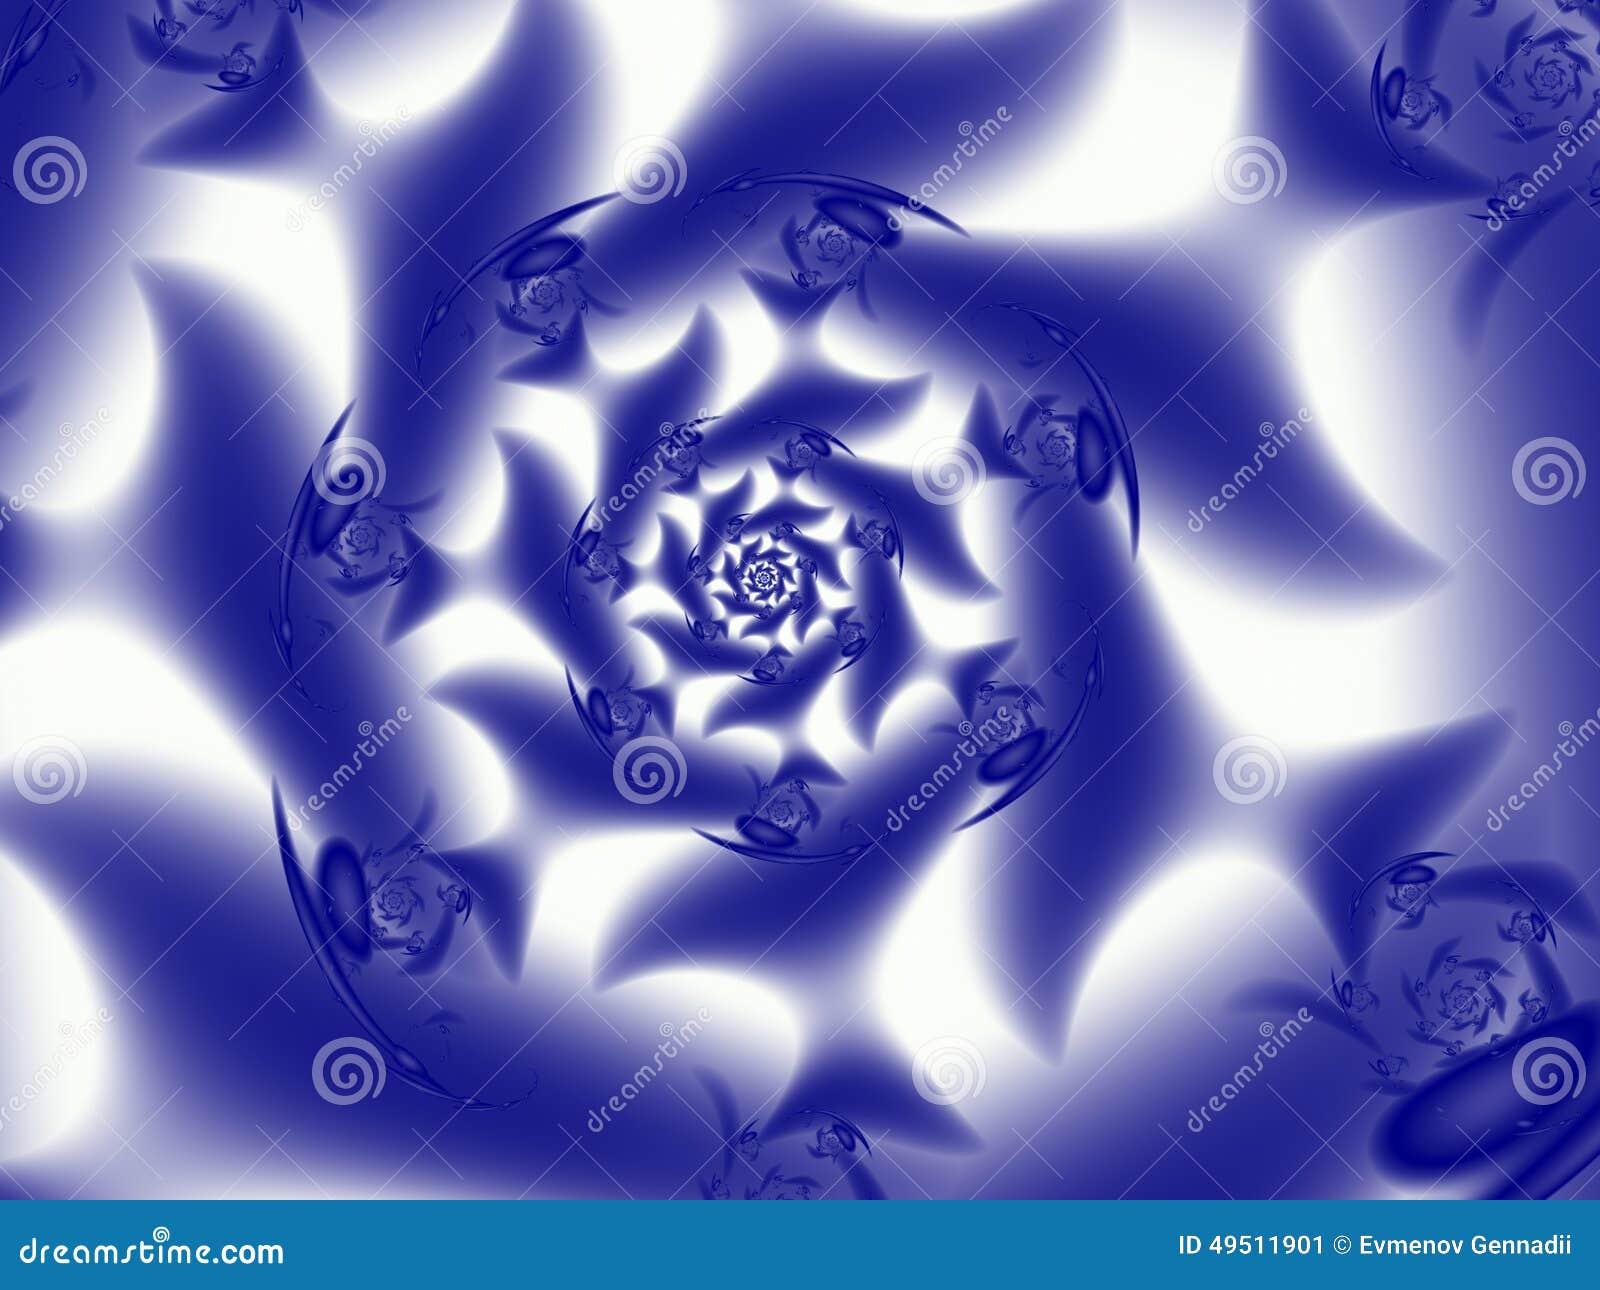 illustration fractal background clocks - photo #17